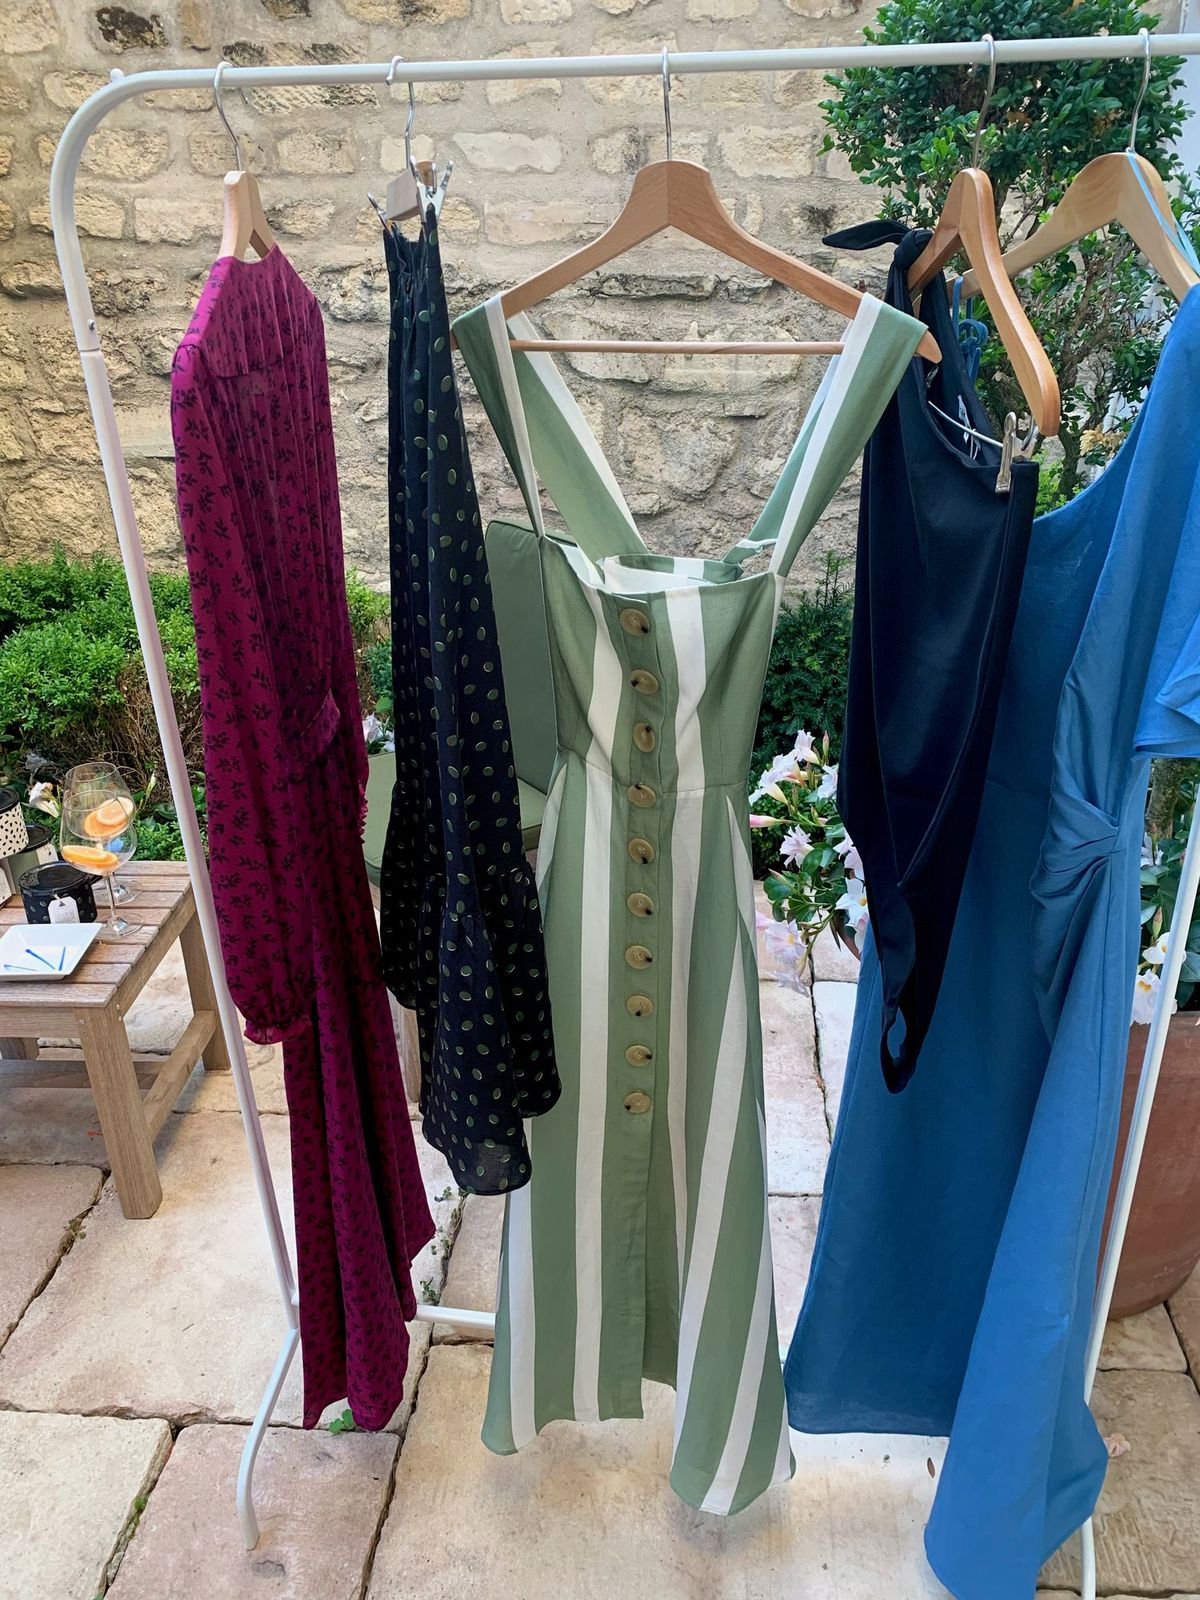 Mirae x Mimi Thorisson collaboration dresses